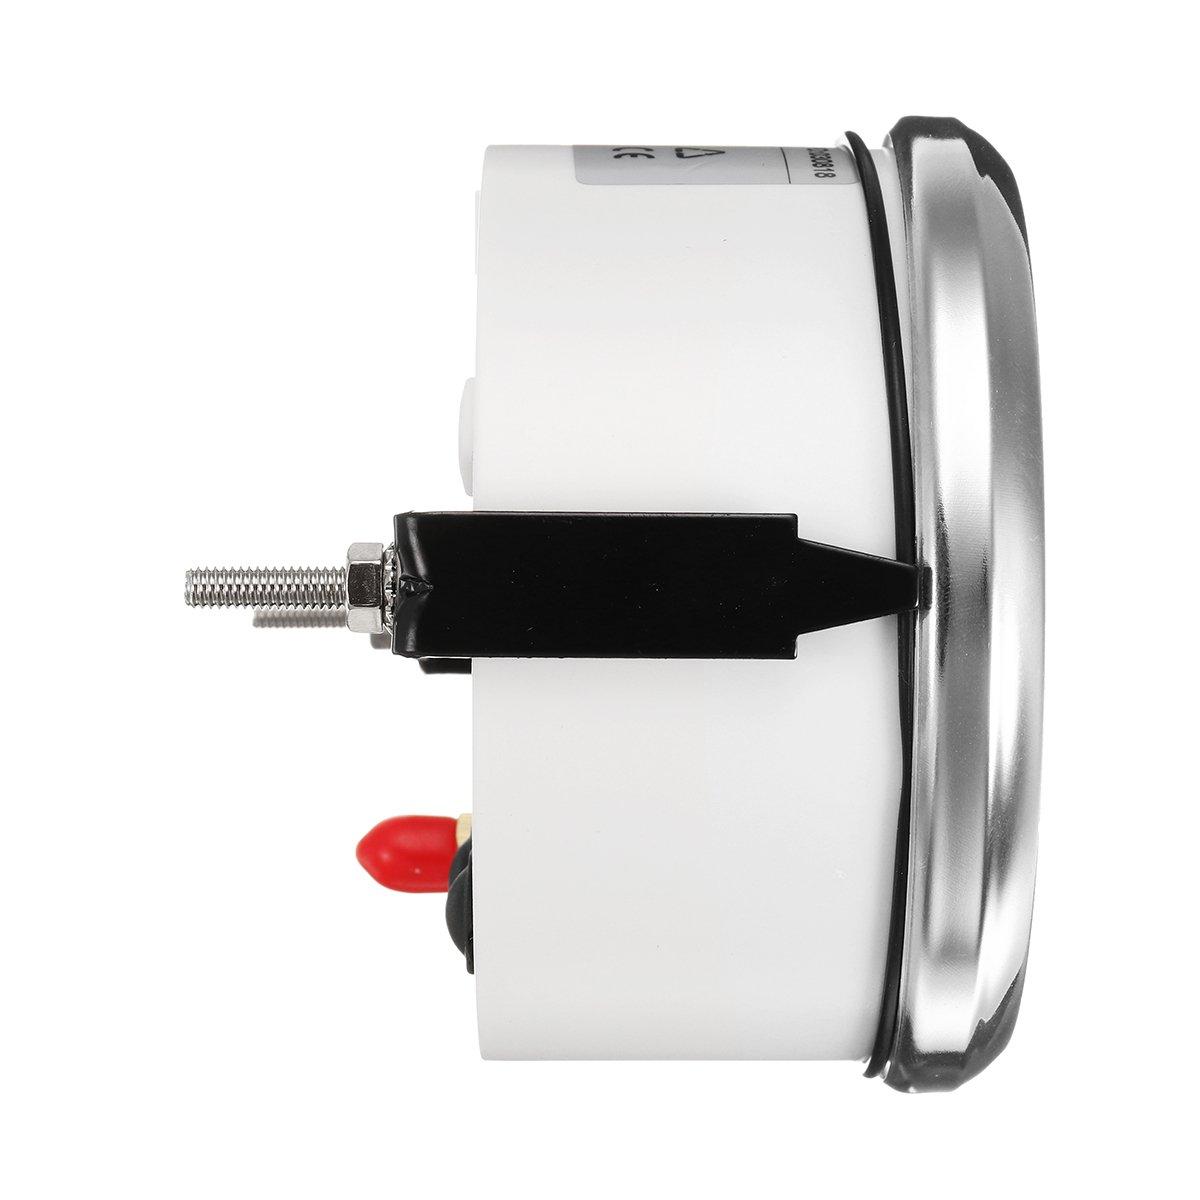 NeDonald 85mm GPS Speedometer Oil Pressure Fuel Gauge Tachometer with Antenna by NeDonald (Image #4)